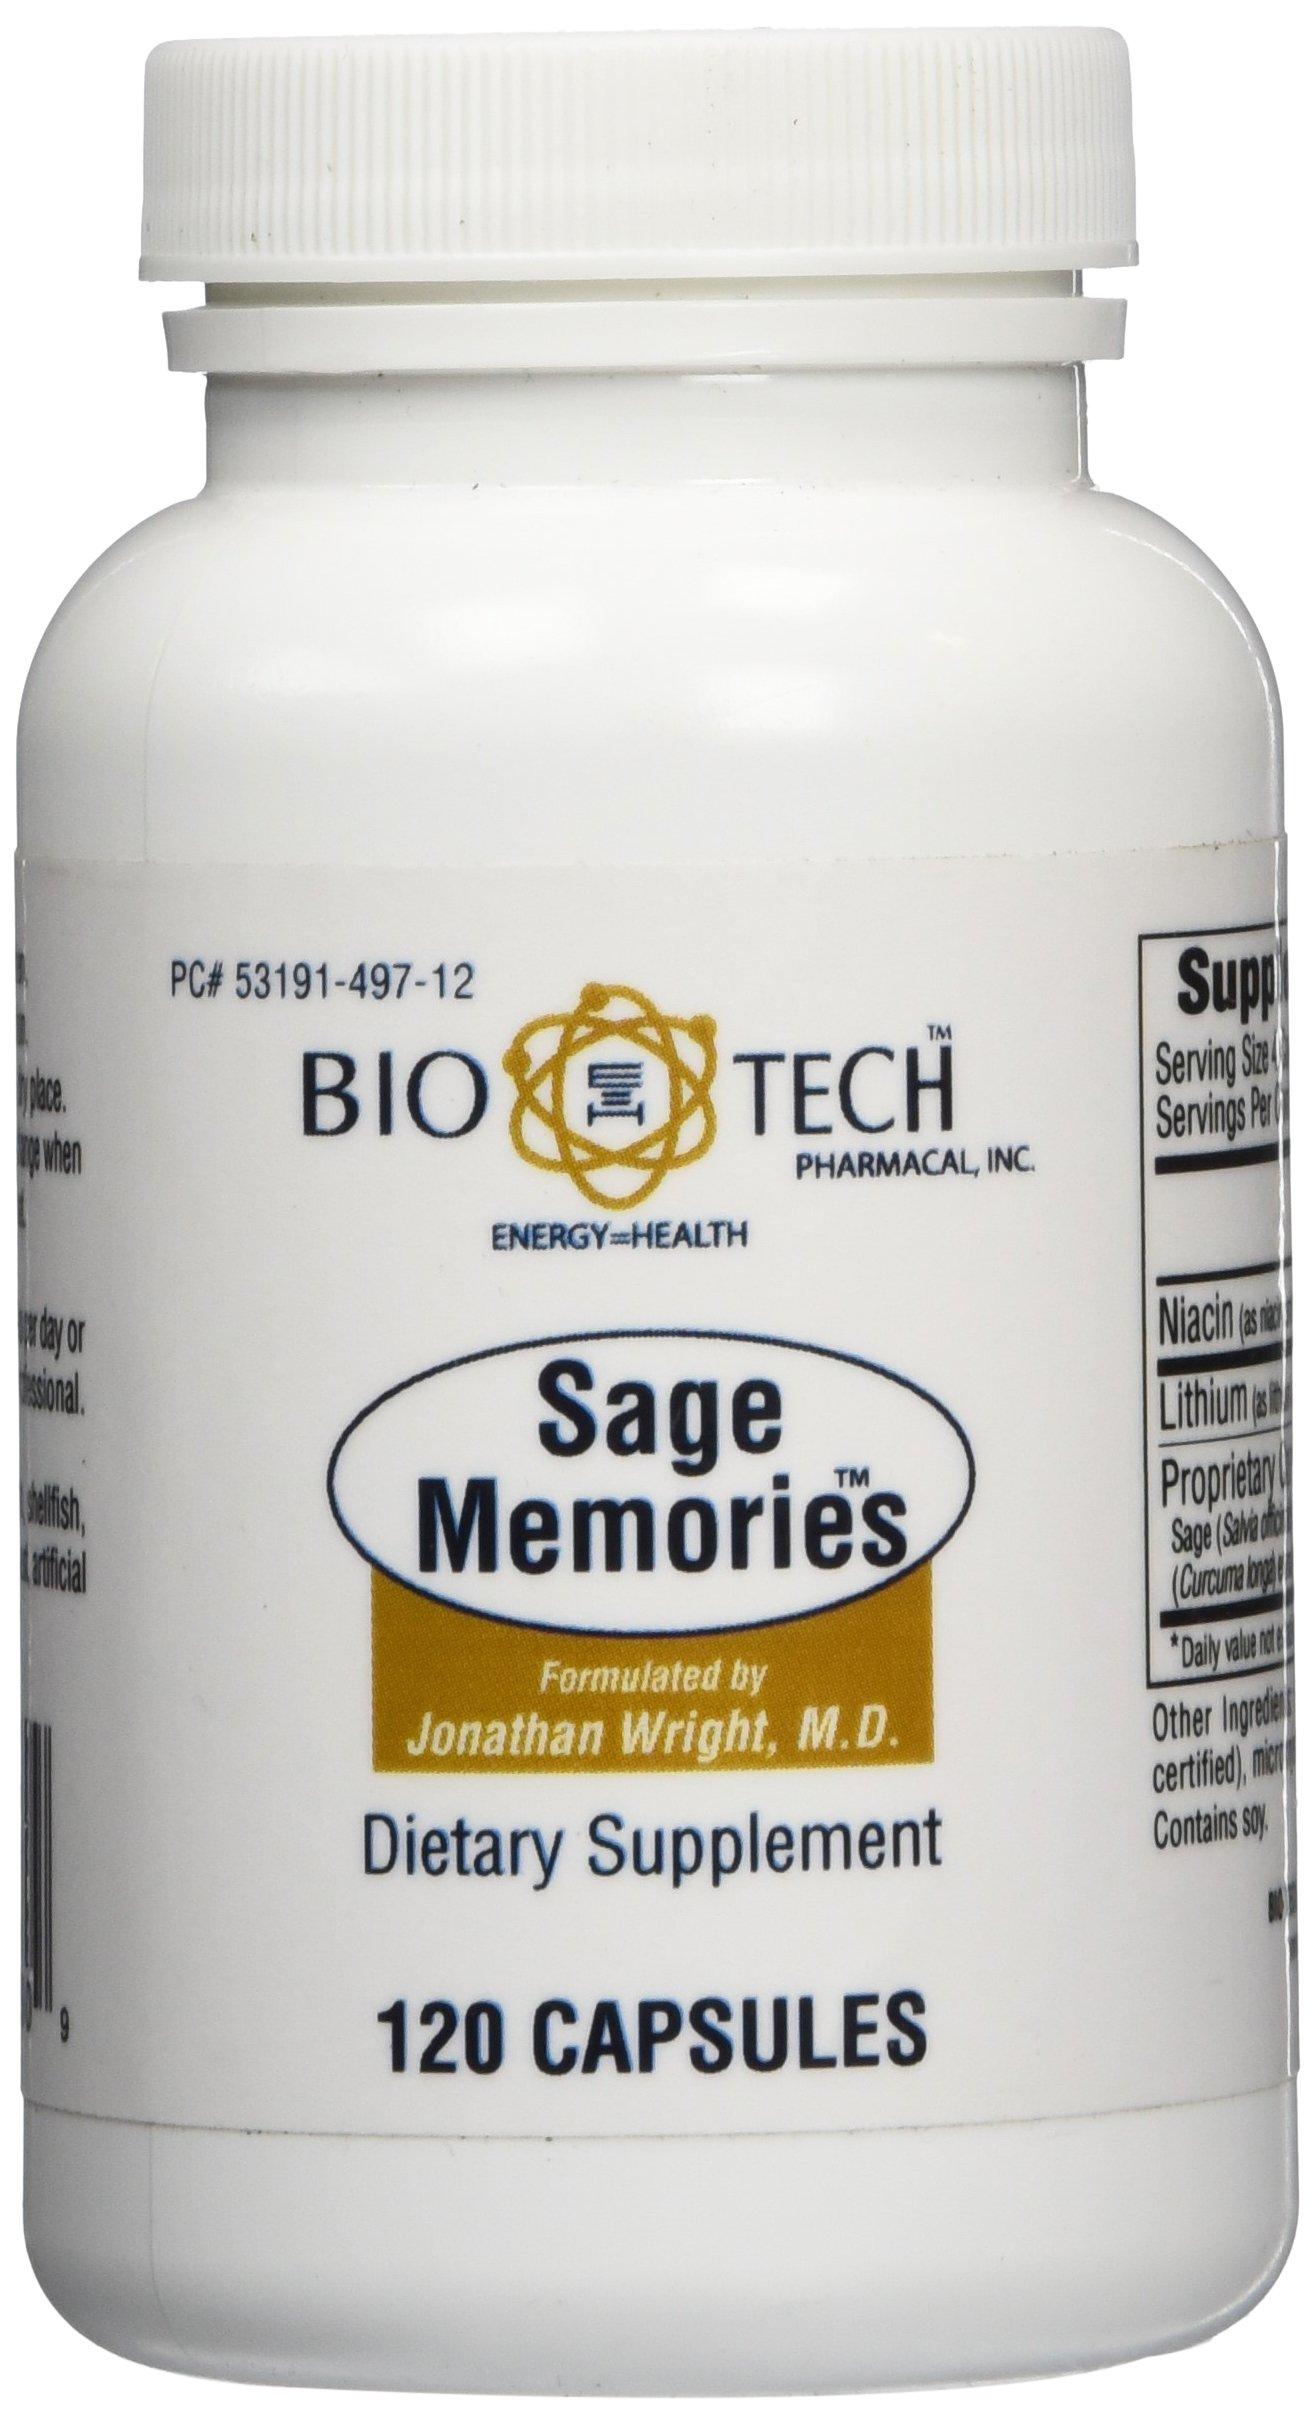 BioTech Pharmacal - Sage Memories - 120 Count